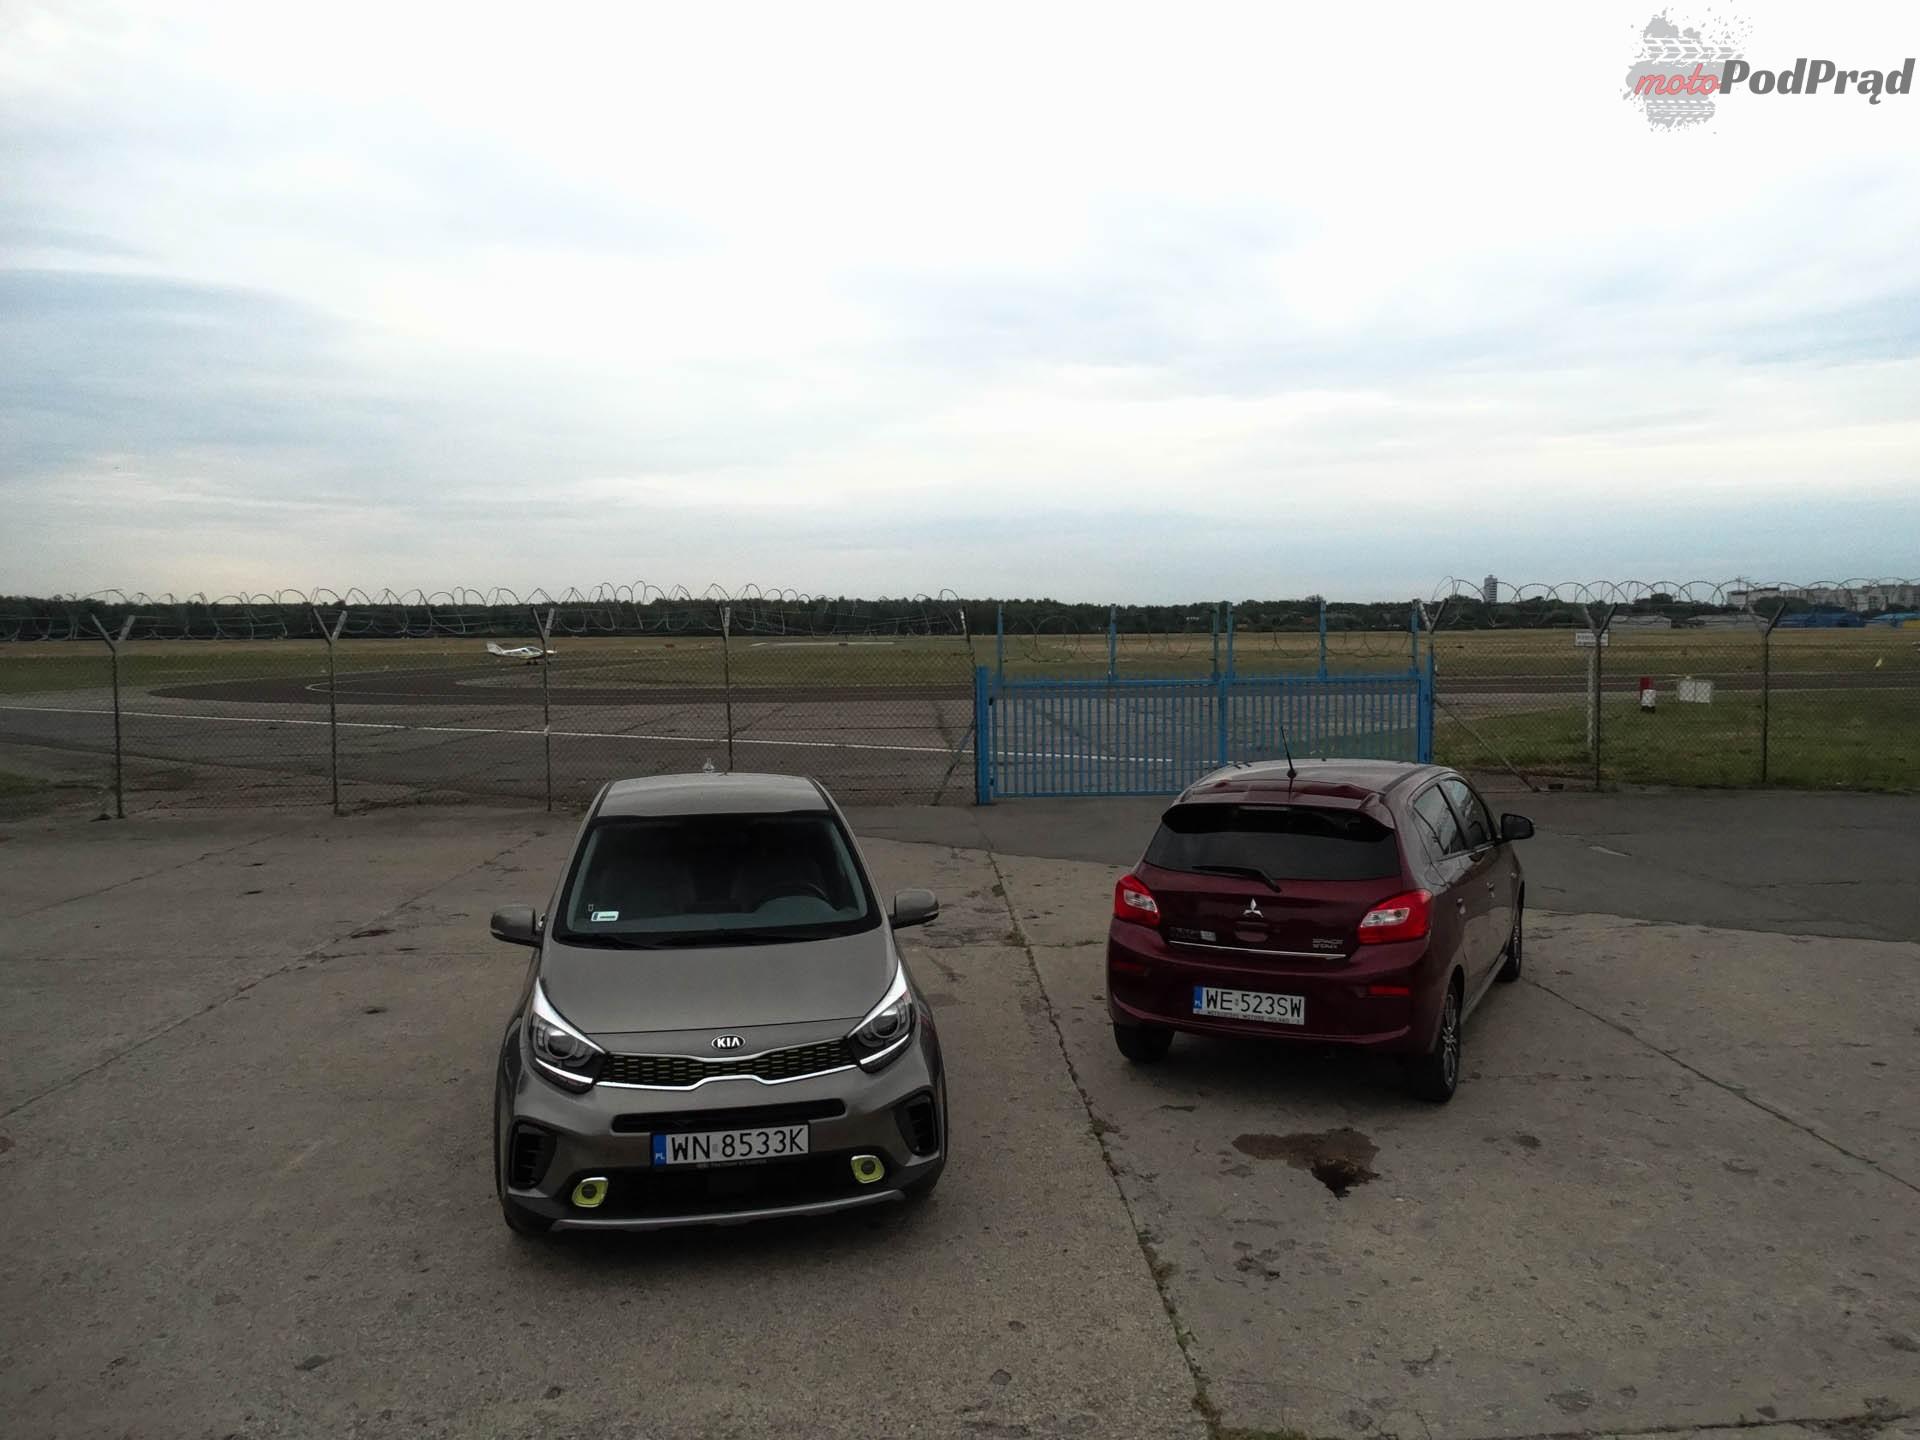 Kia Picanto vs Mitsubishi Space Star 4 Porównanie: Kia Picanto kontra Mitsubishi Space Star   dwa światy